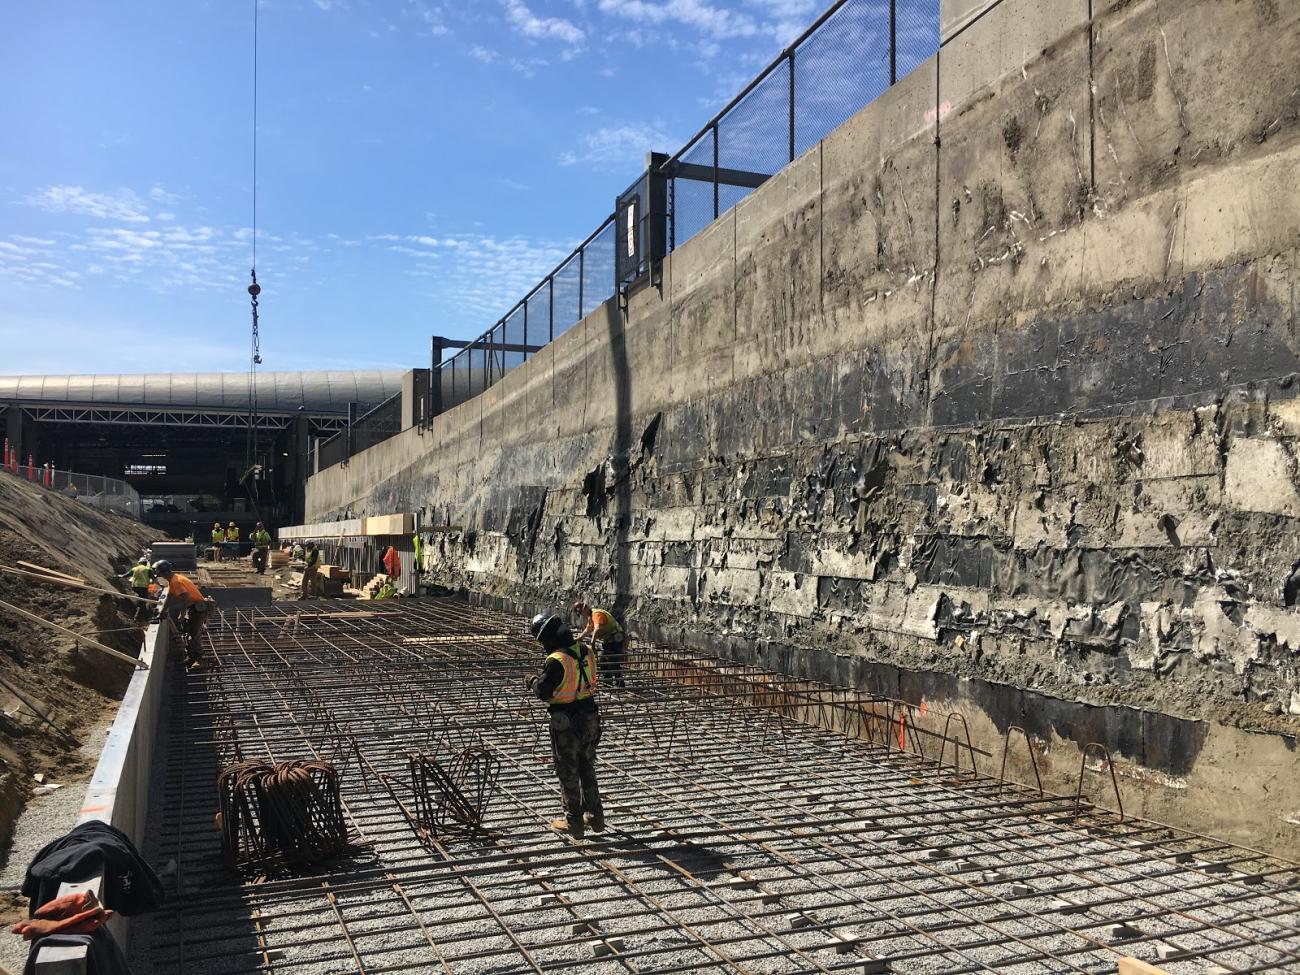 New platform under construction (March 2018)